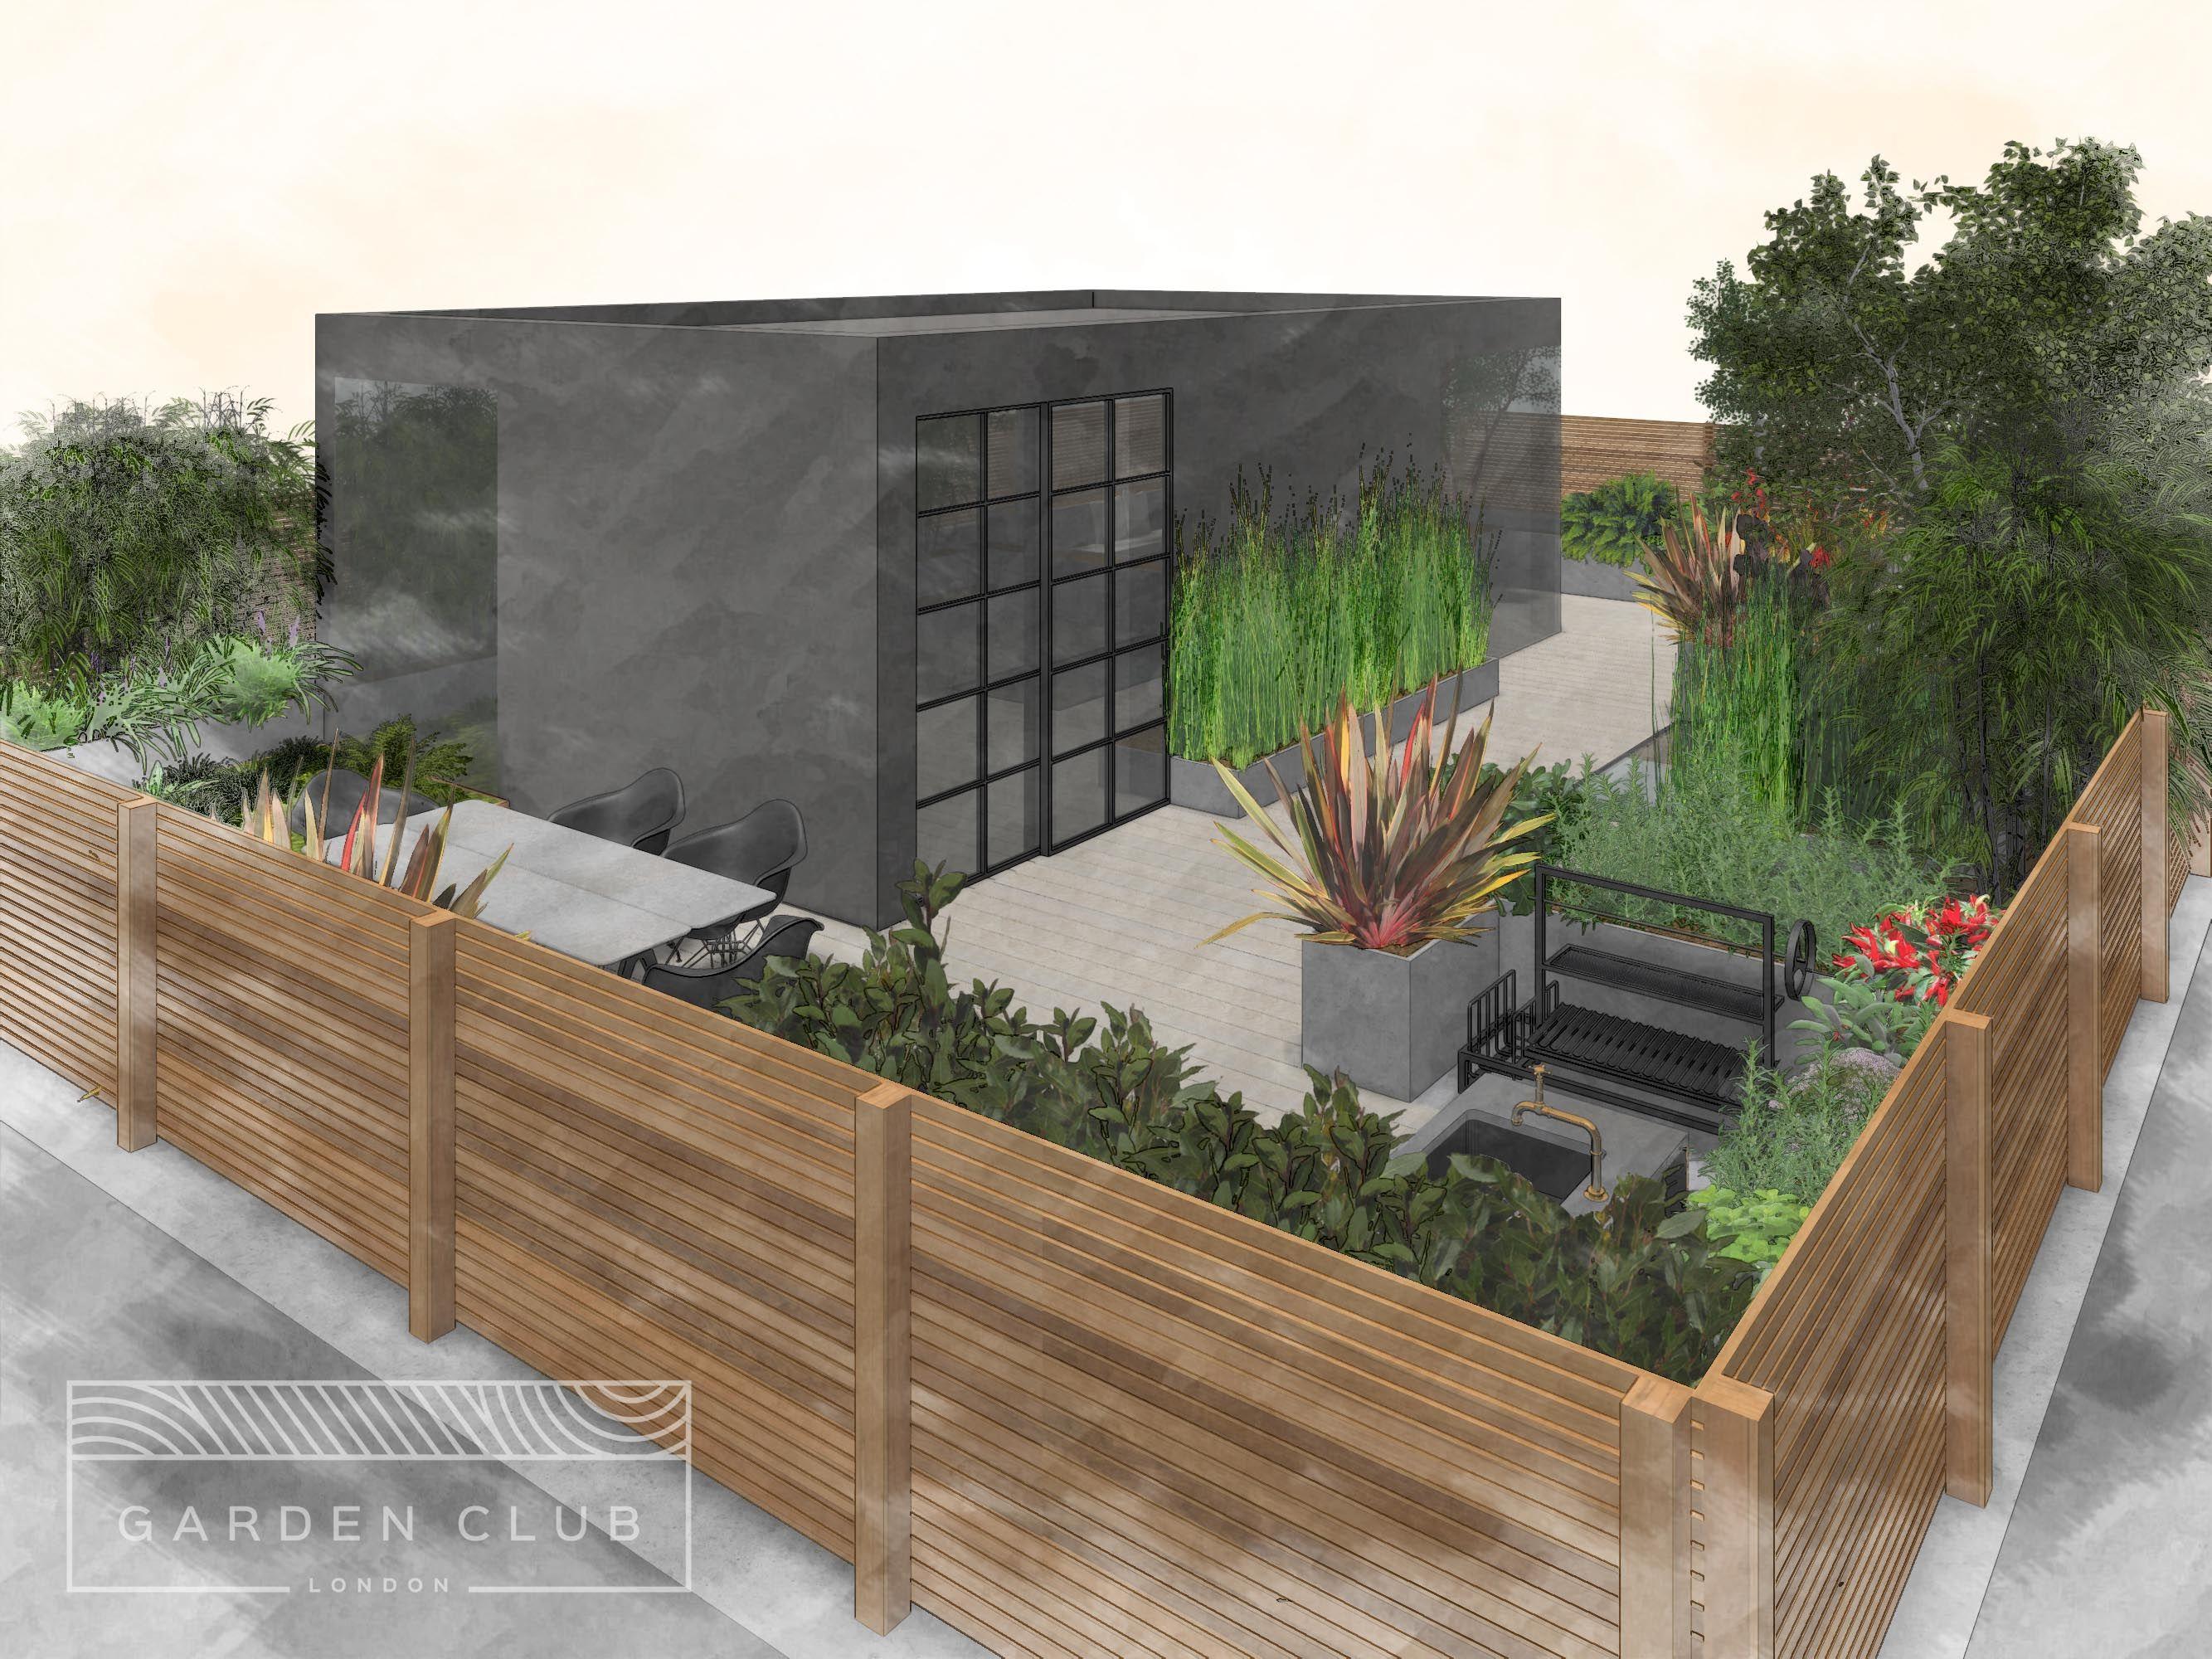 Rooftop garden design | Garden Club London | FormZ ...